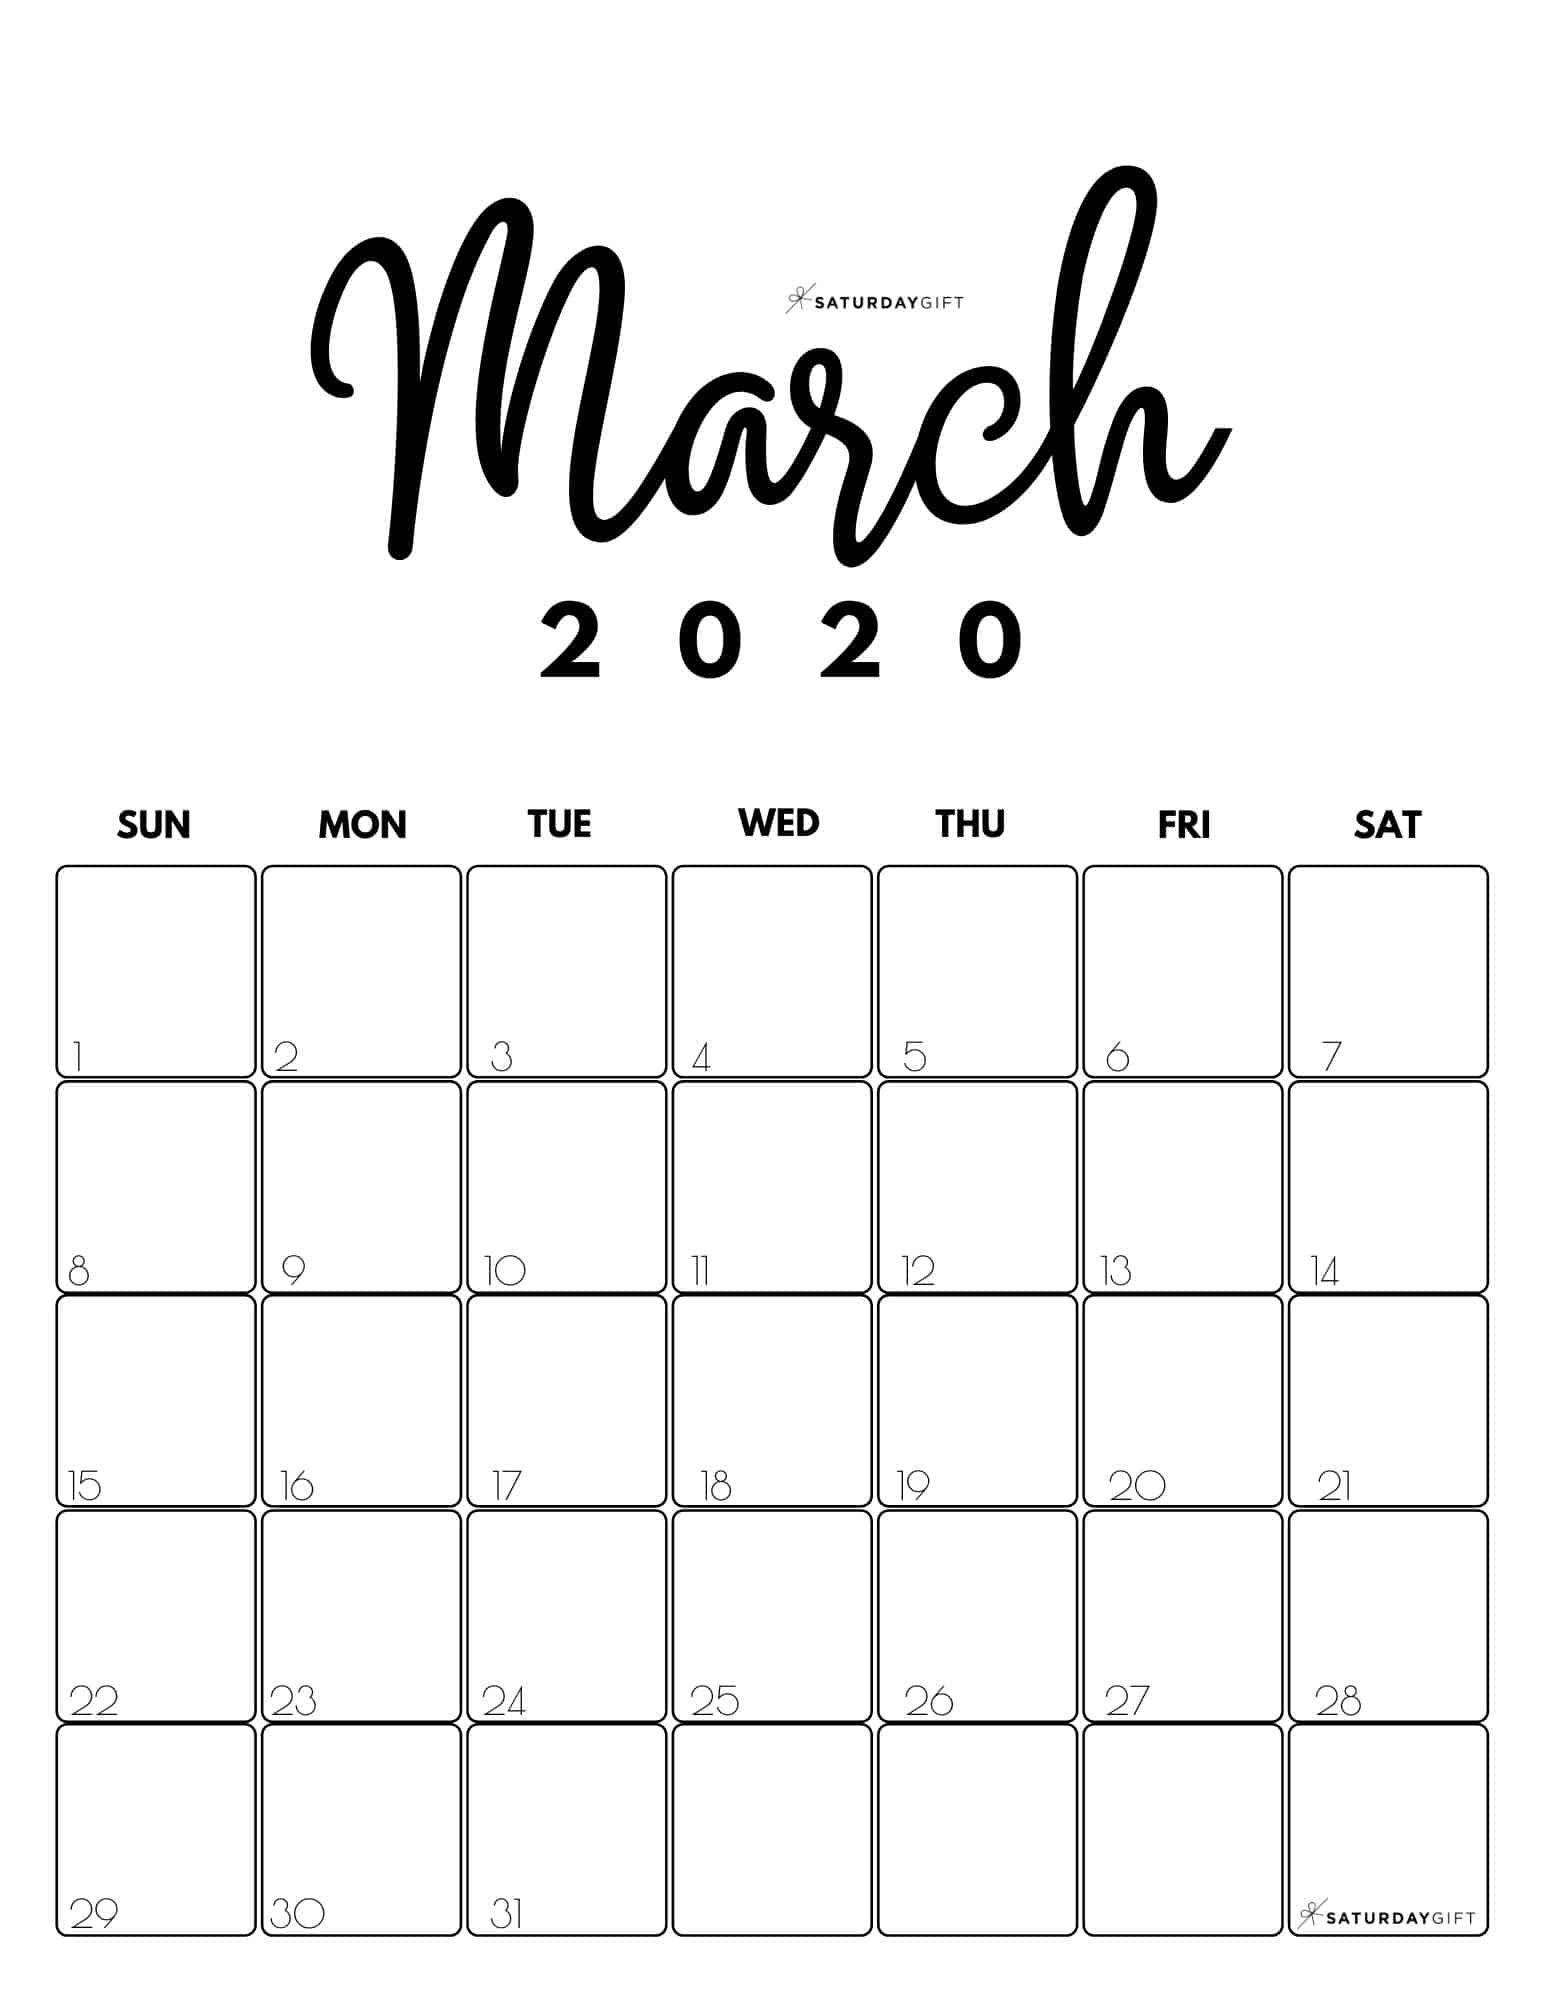 March Blank Calendar 2022.Cute Free Printable March 2022 Calendar Saturdaygift Monthly Calendar Printable Calendar Printables Calendar March